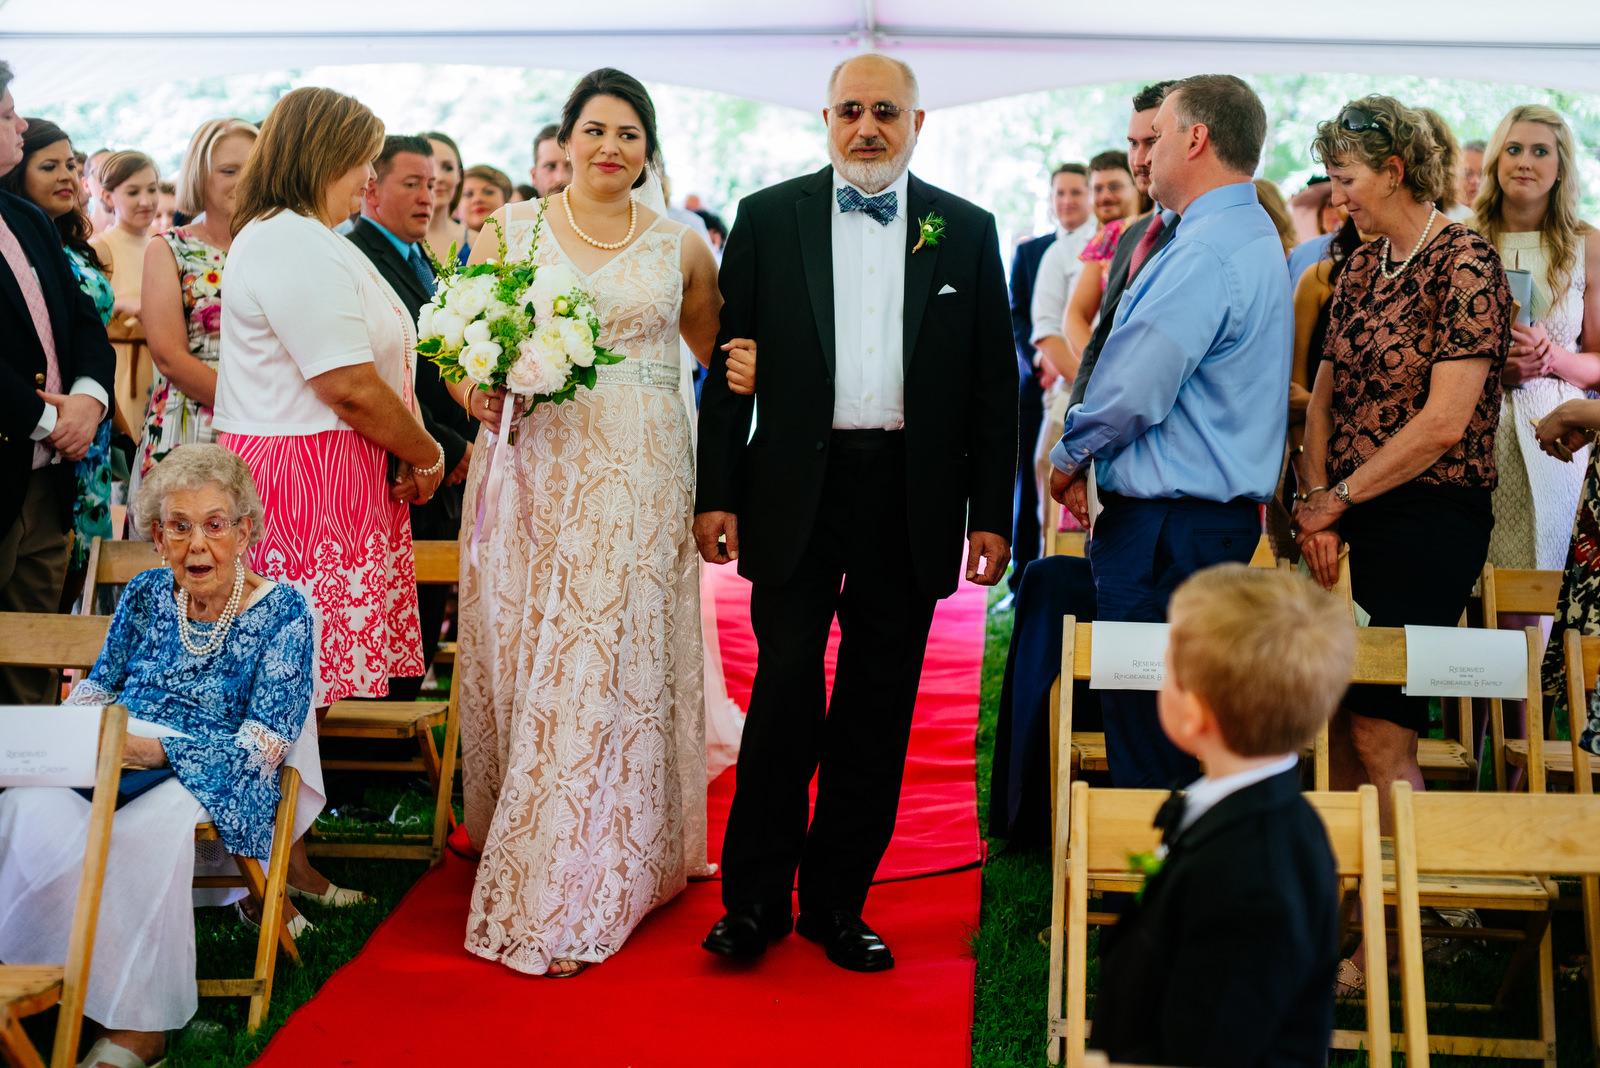 bride walking down aisle holly hill inn wedding lexington kentucky